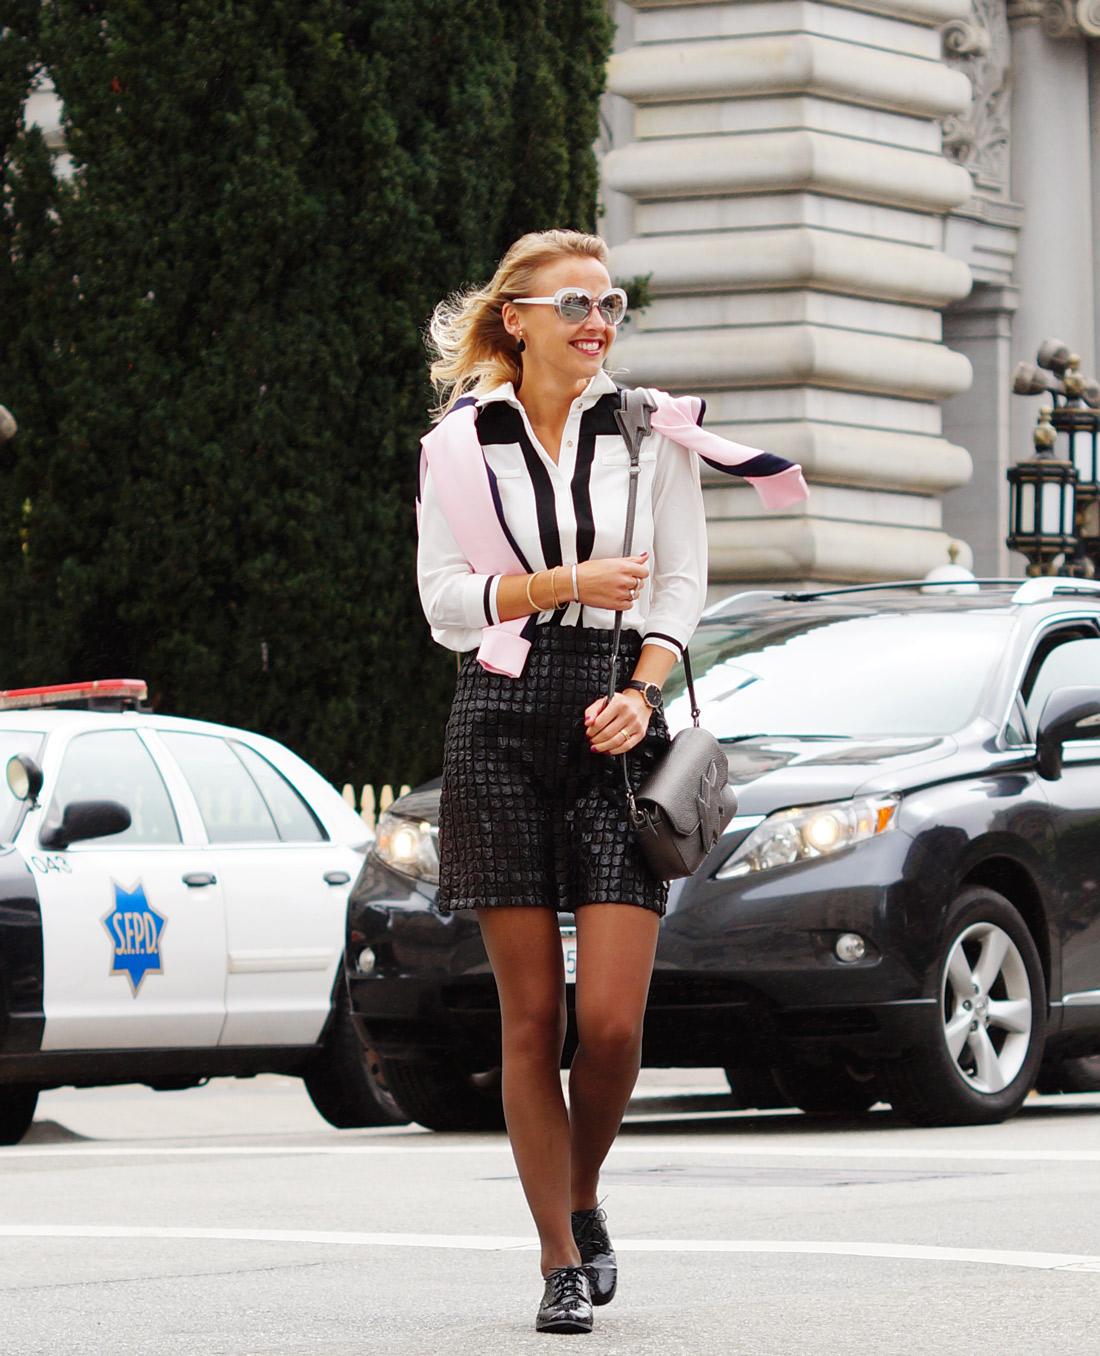 bag-at-you-fashion-blog-dezzal-feminine-style